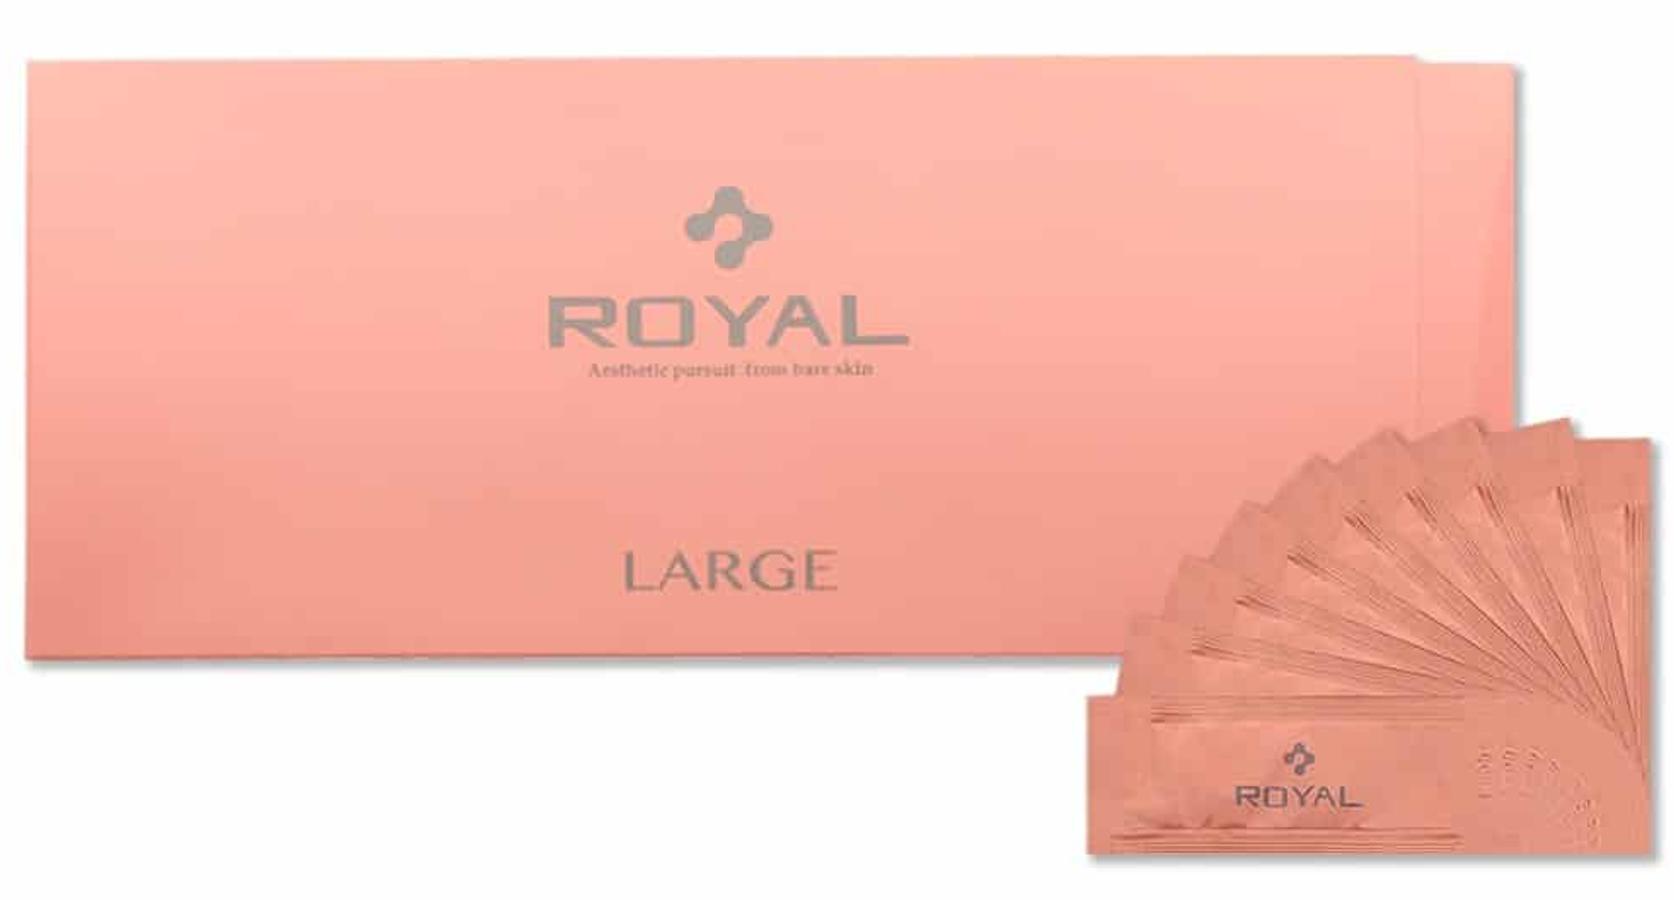 Tinh Chất Serum Nhau Thai Cuống Rốn Cừu Royal Large Placenta